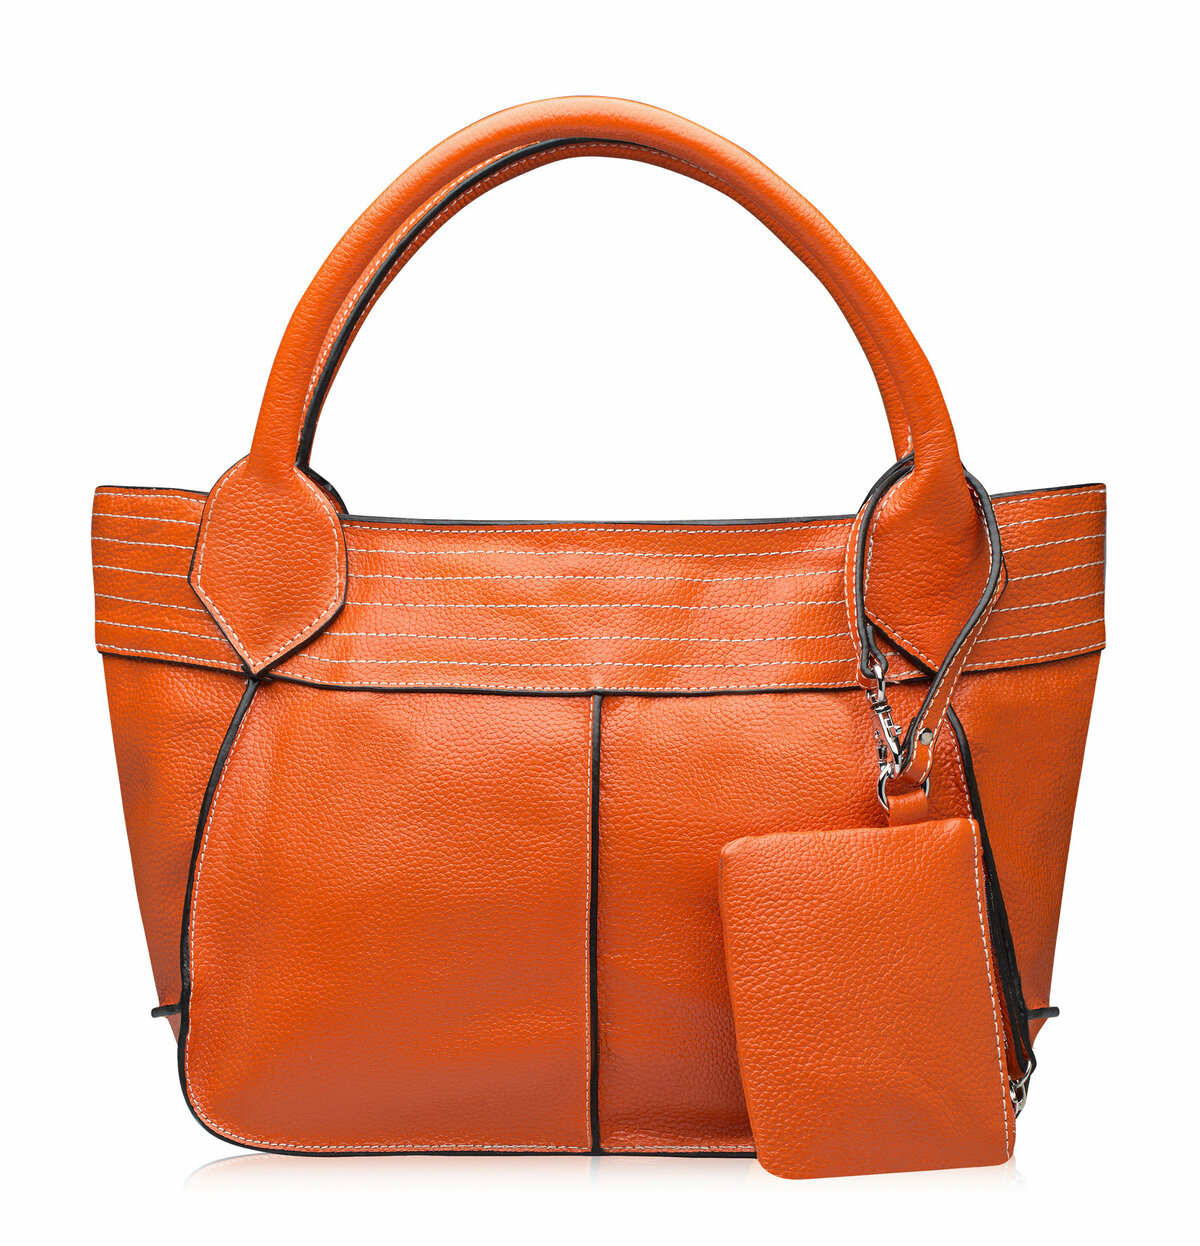 Картинка женской сумочки